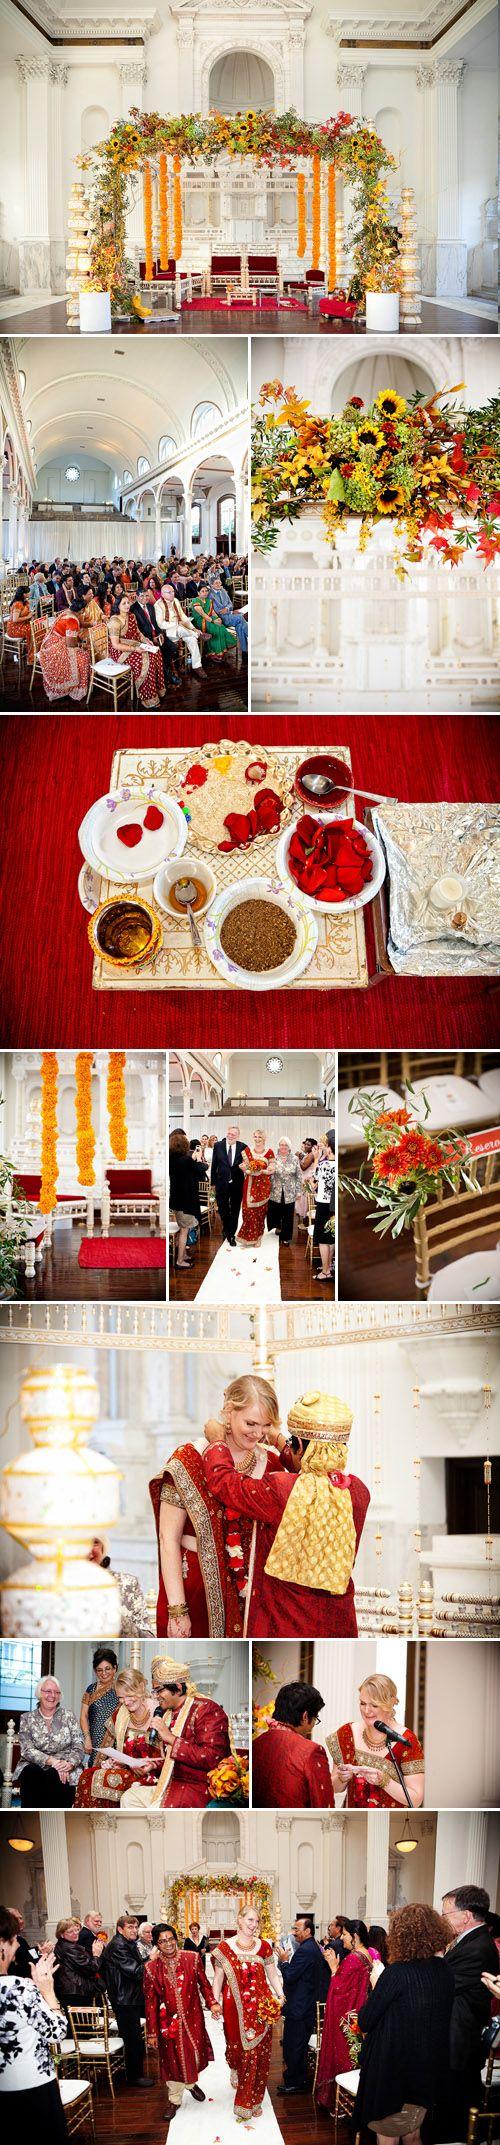 16 best Detail Shots images on Pinterest | Shots, Wedding blog and ...